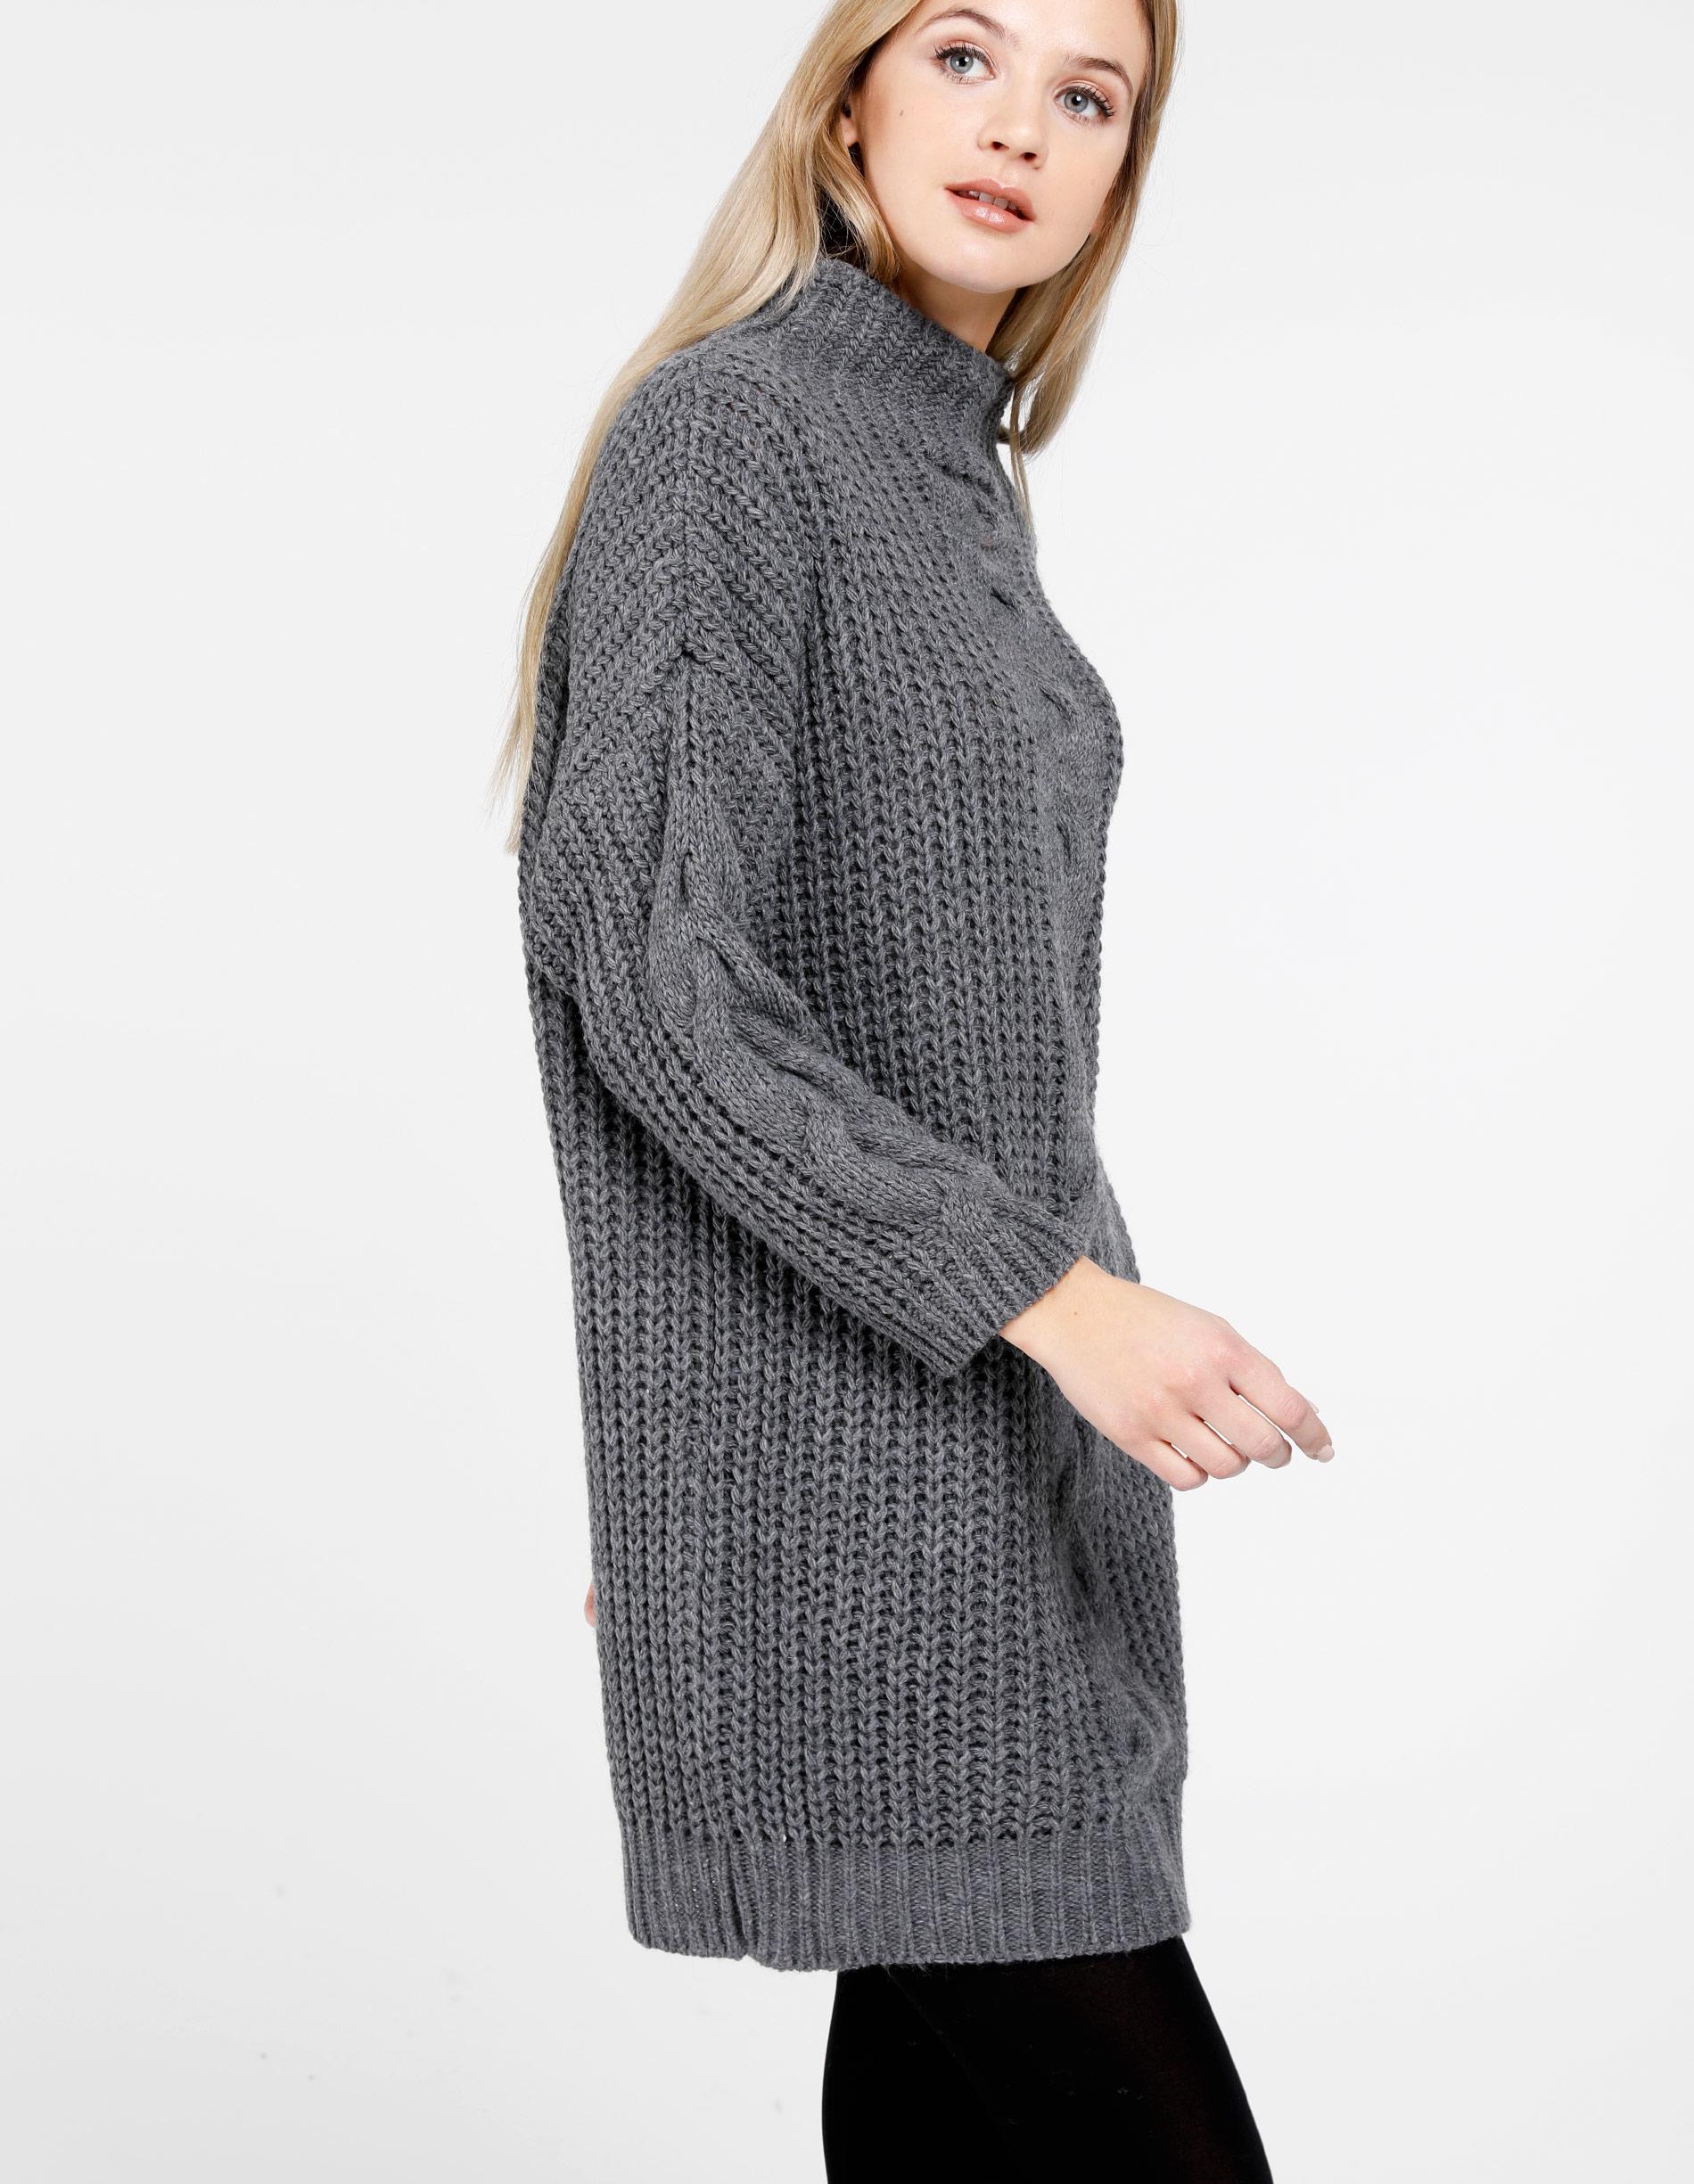 Sweter - 167-890 GR SC - Unisono